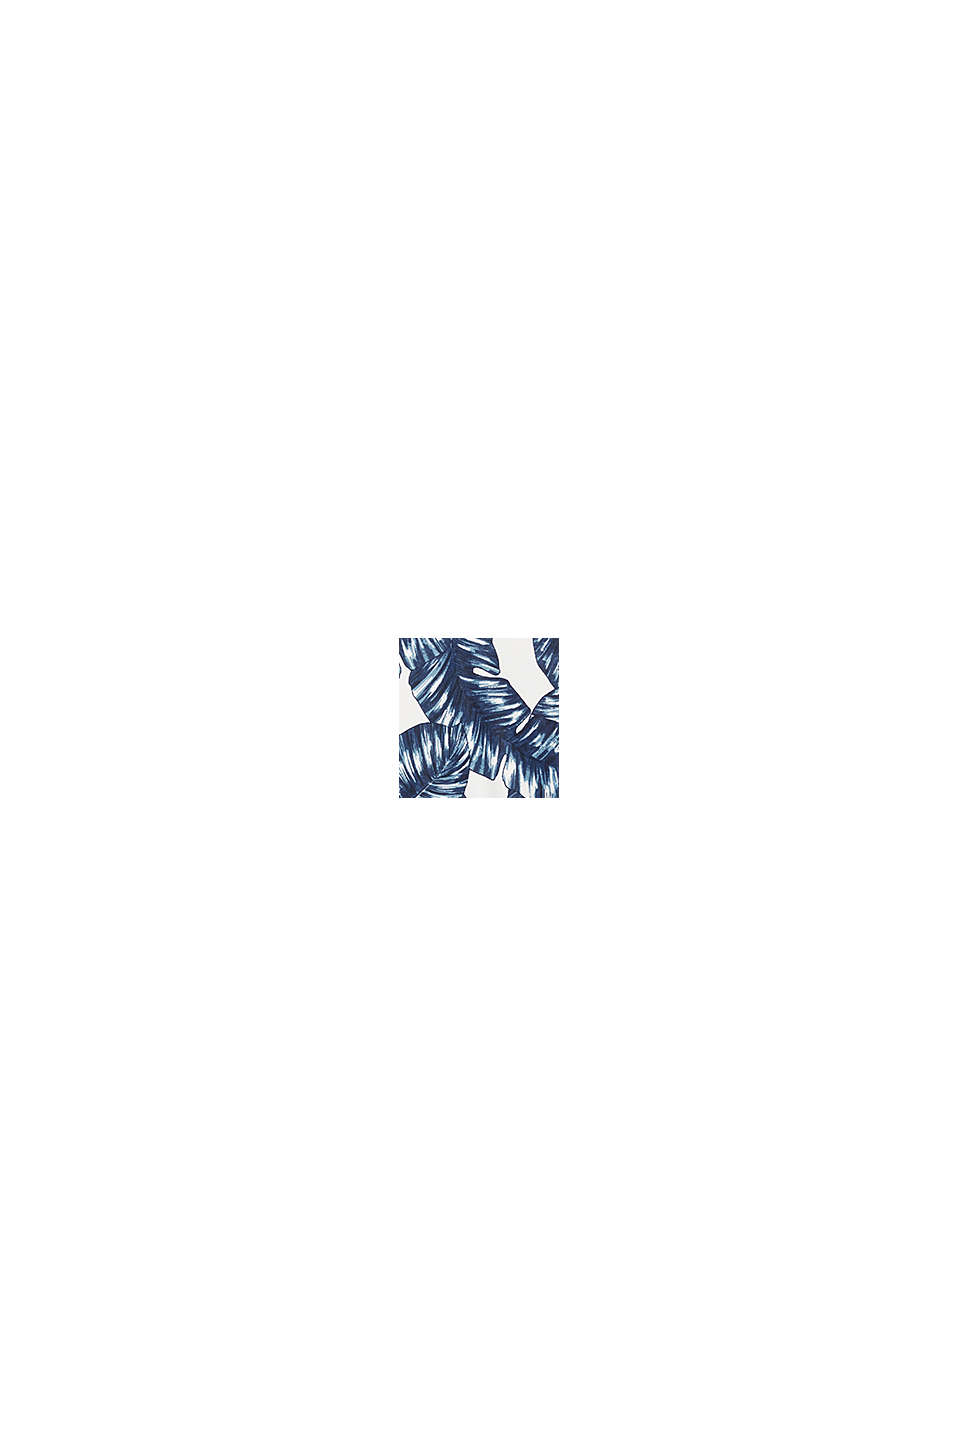 Midi briefs with a leaf print, NAVY, swatch